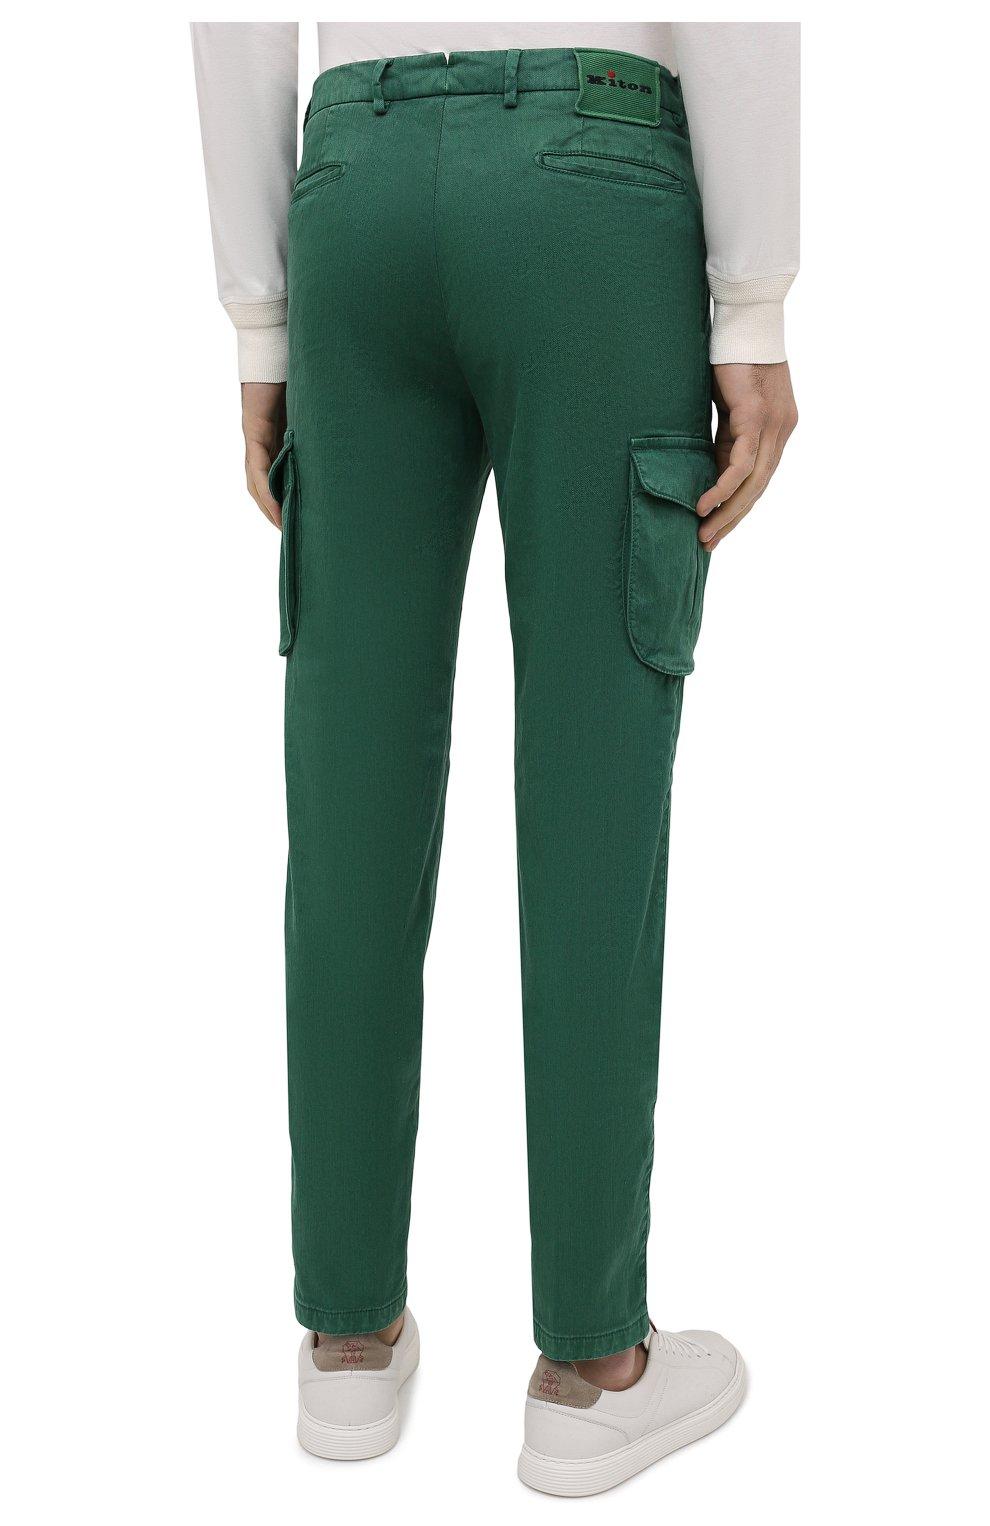 Мужские брюки-карго изо льна и хлопка KITON зеленого цвета, арт. UFPPCAJ07T38   Фото 4